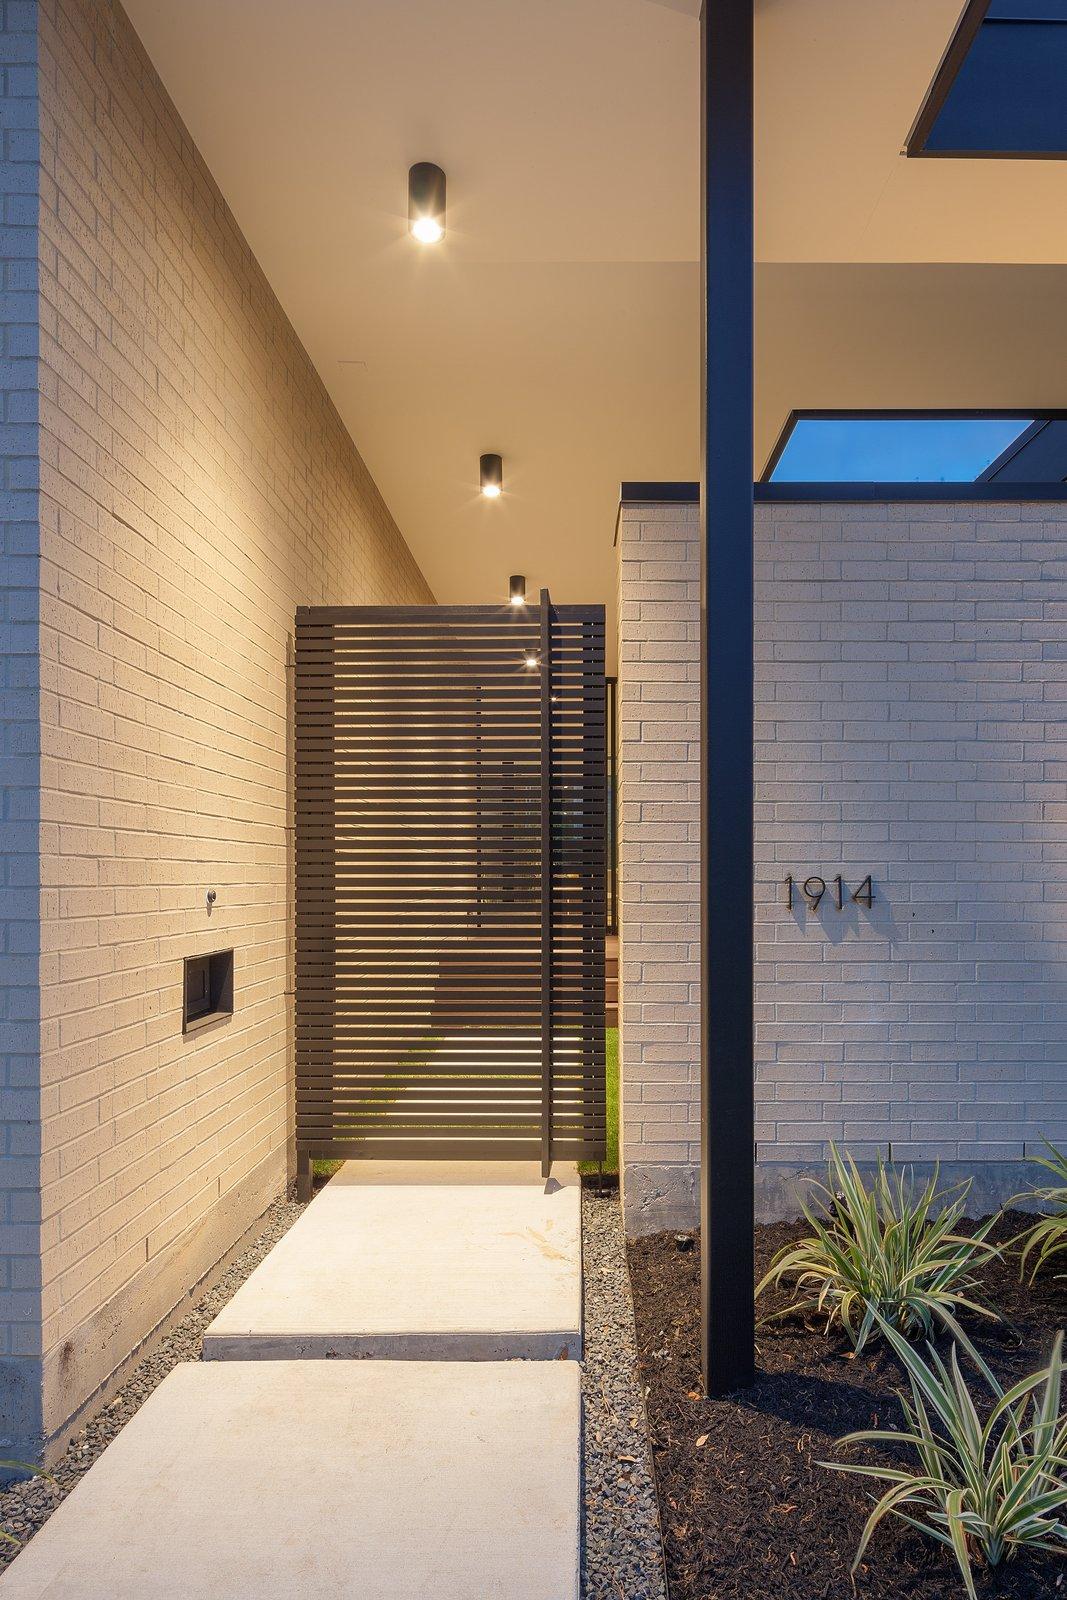 Pavilion Haus entry gate